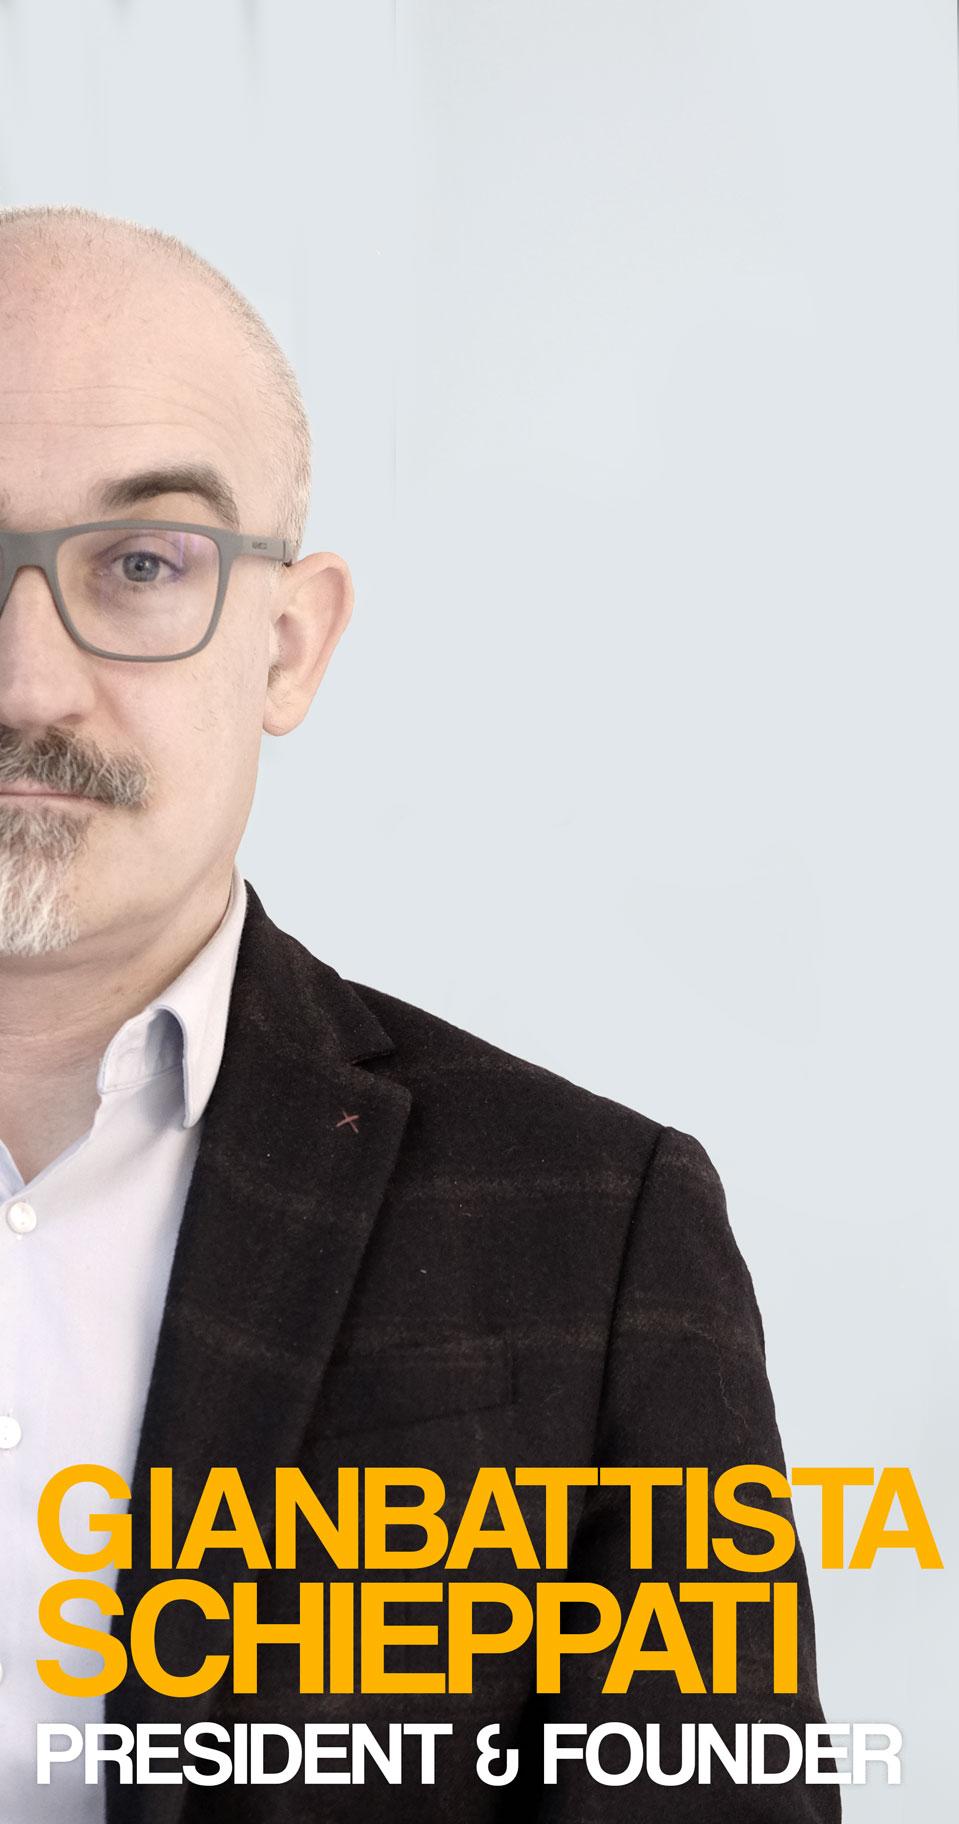 Gianbattista Schieppati